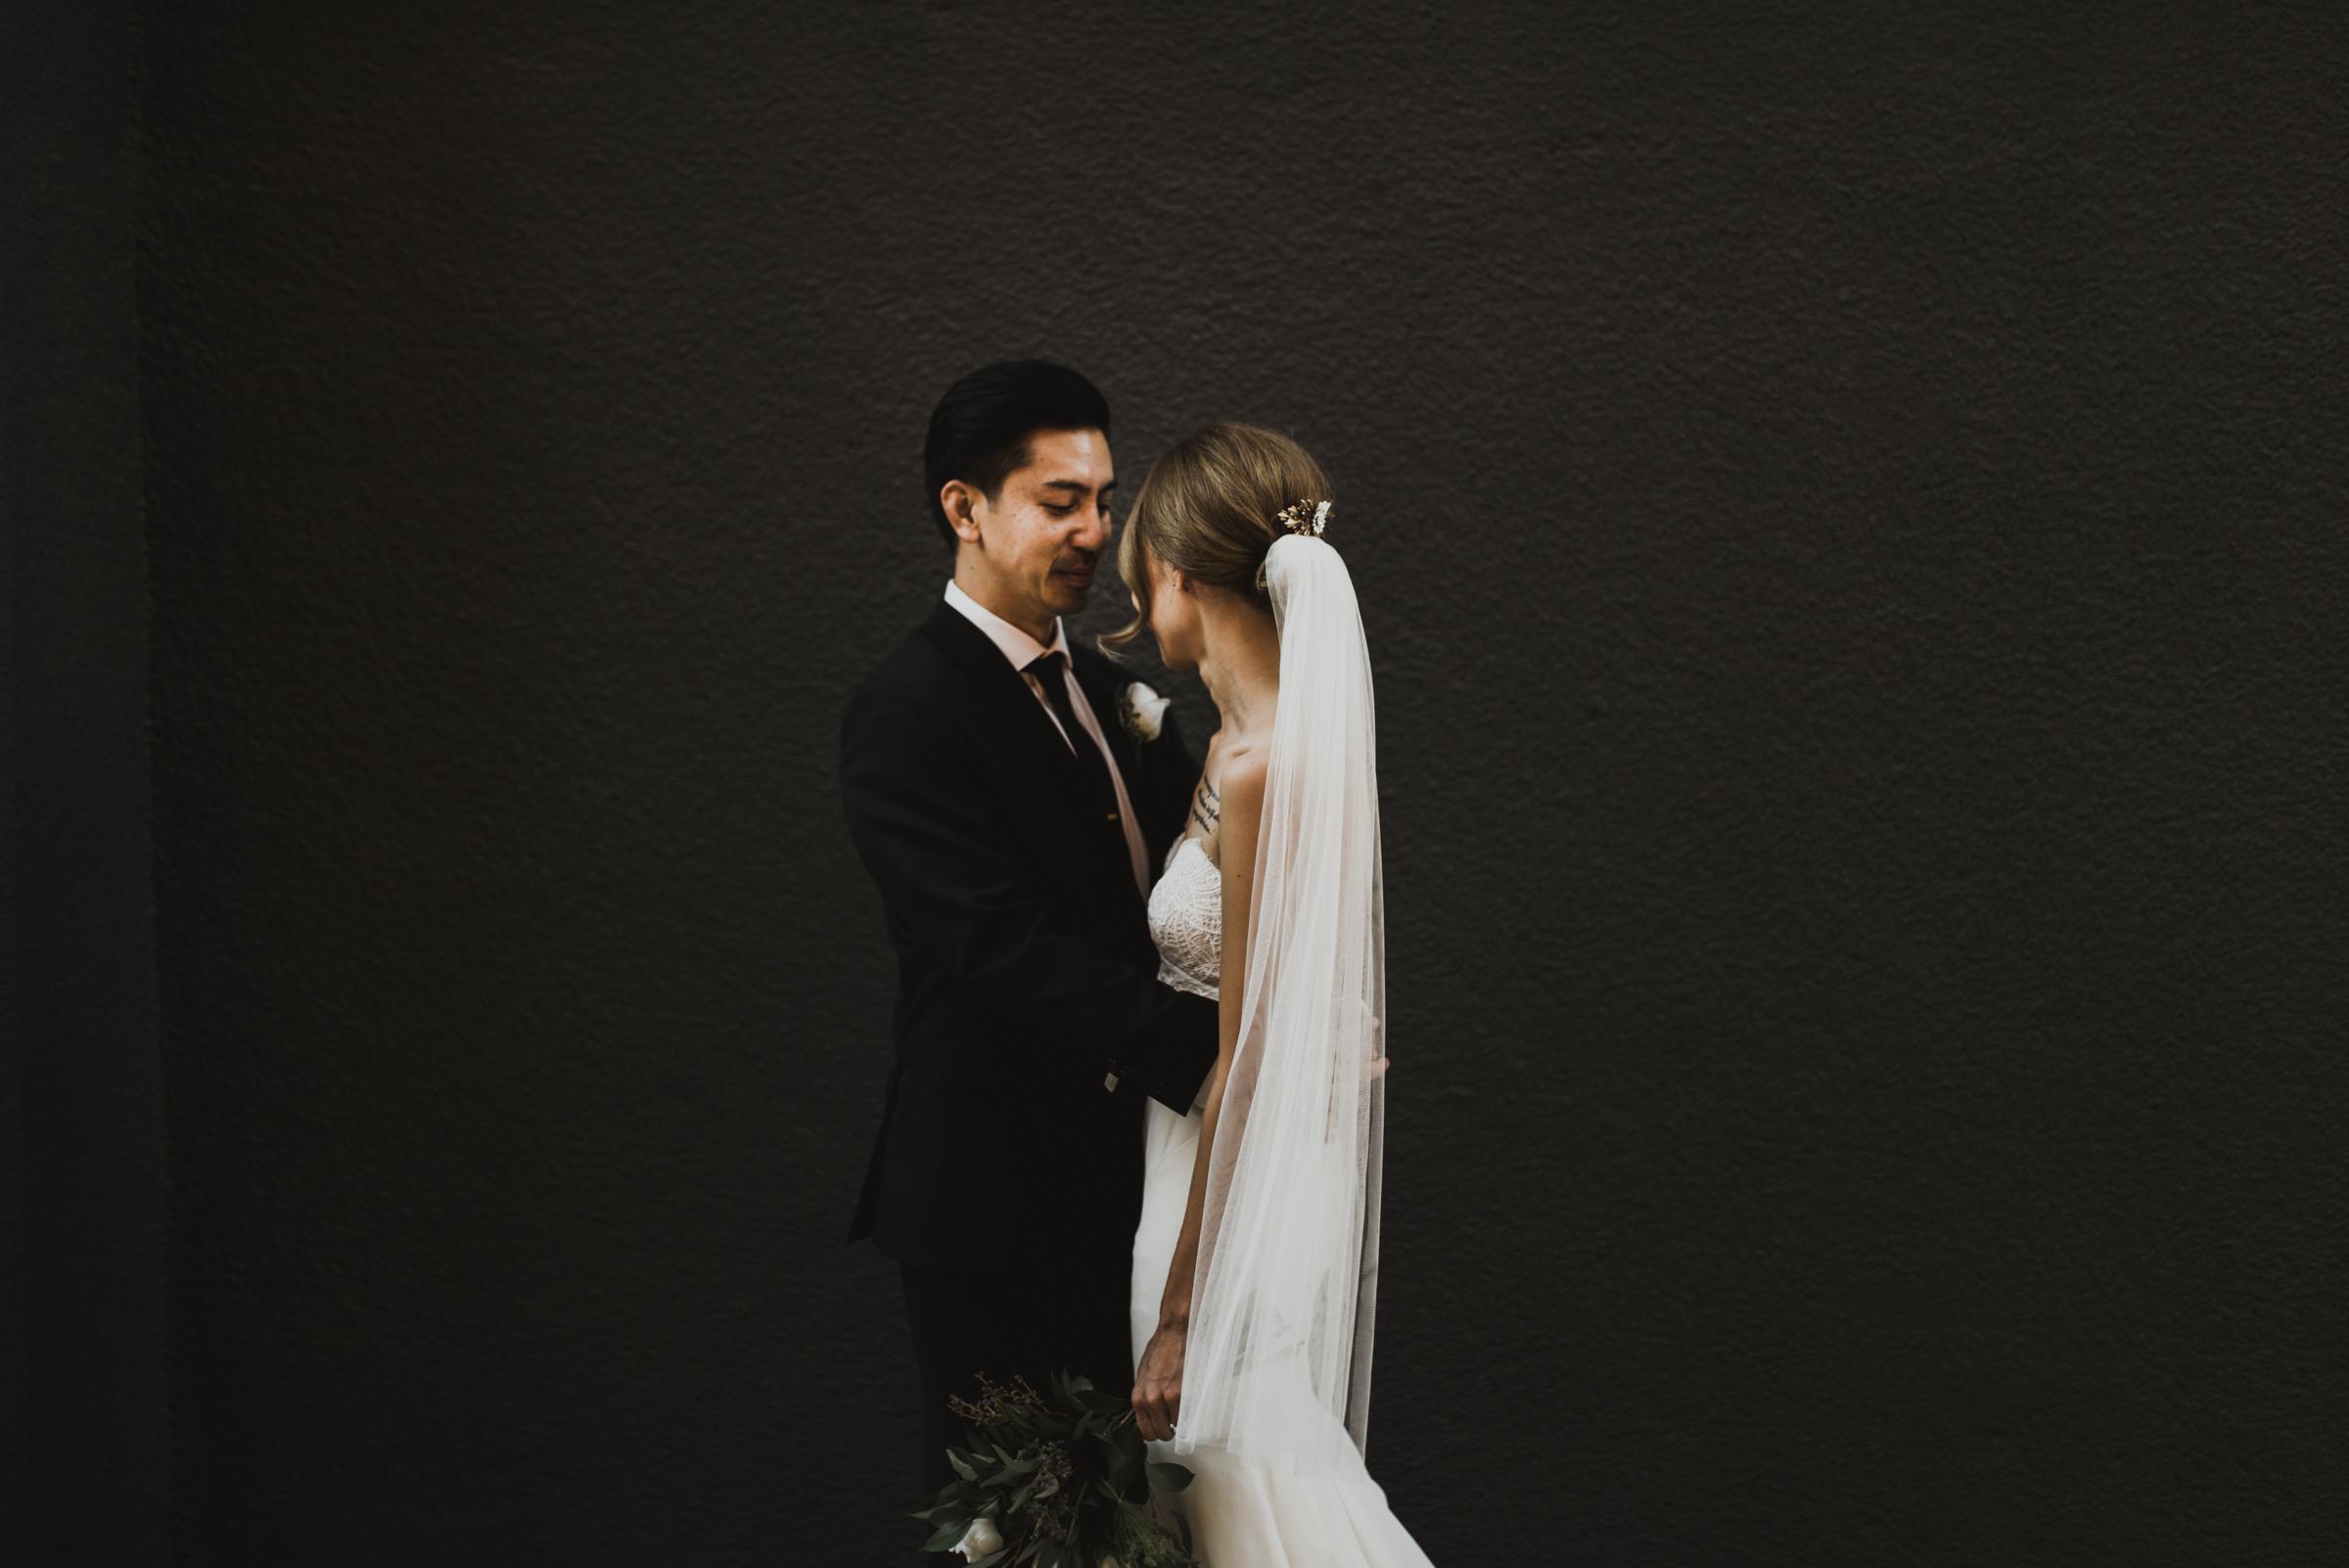 ©Isaiah + Taylor Photography - The Estate On Second Wedding, Santa Ana - Orange County Wedding Photographer-88.jpg